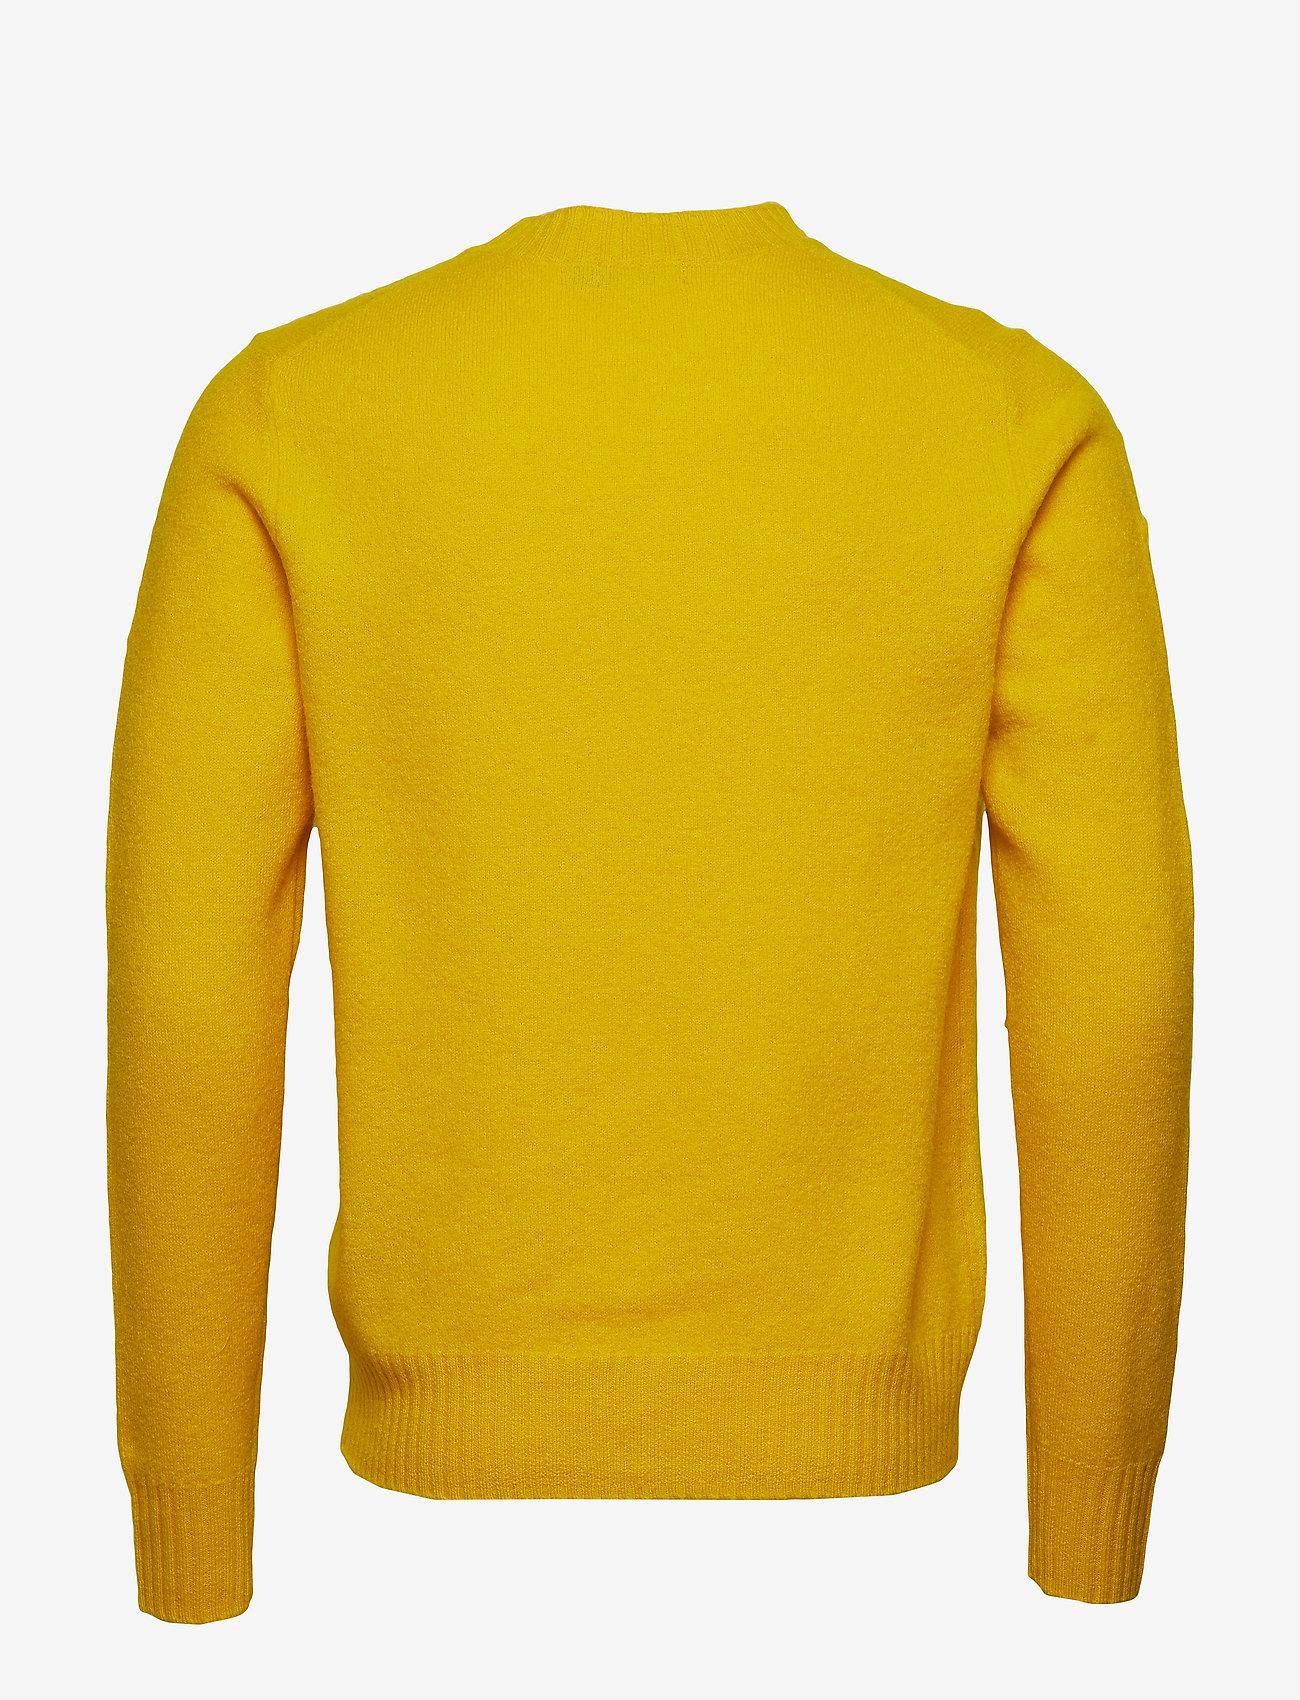 J. Lindeberg Tristan-brushed Wool - Knitwear